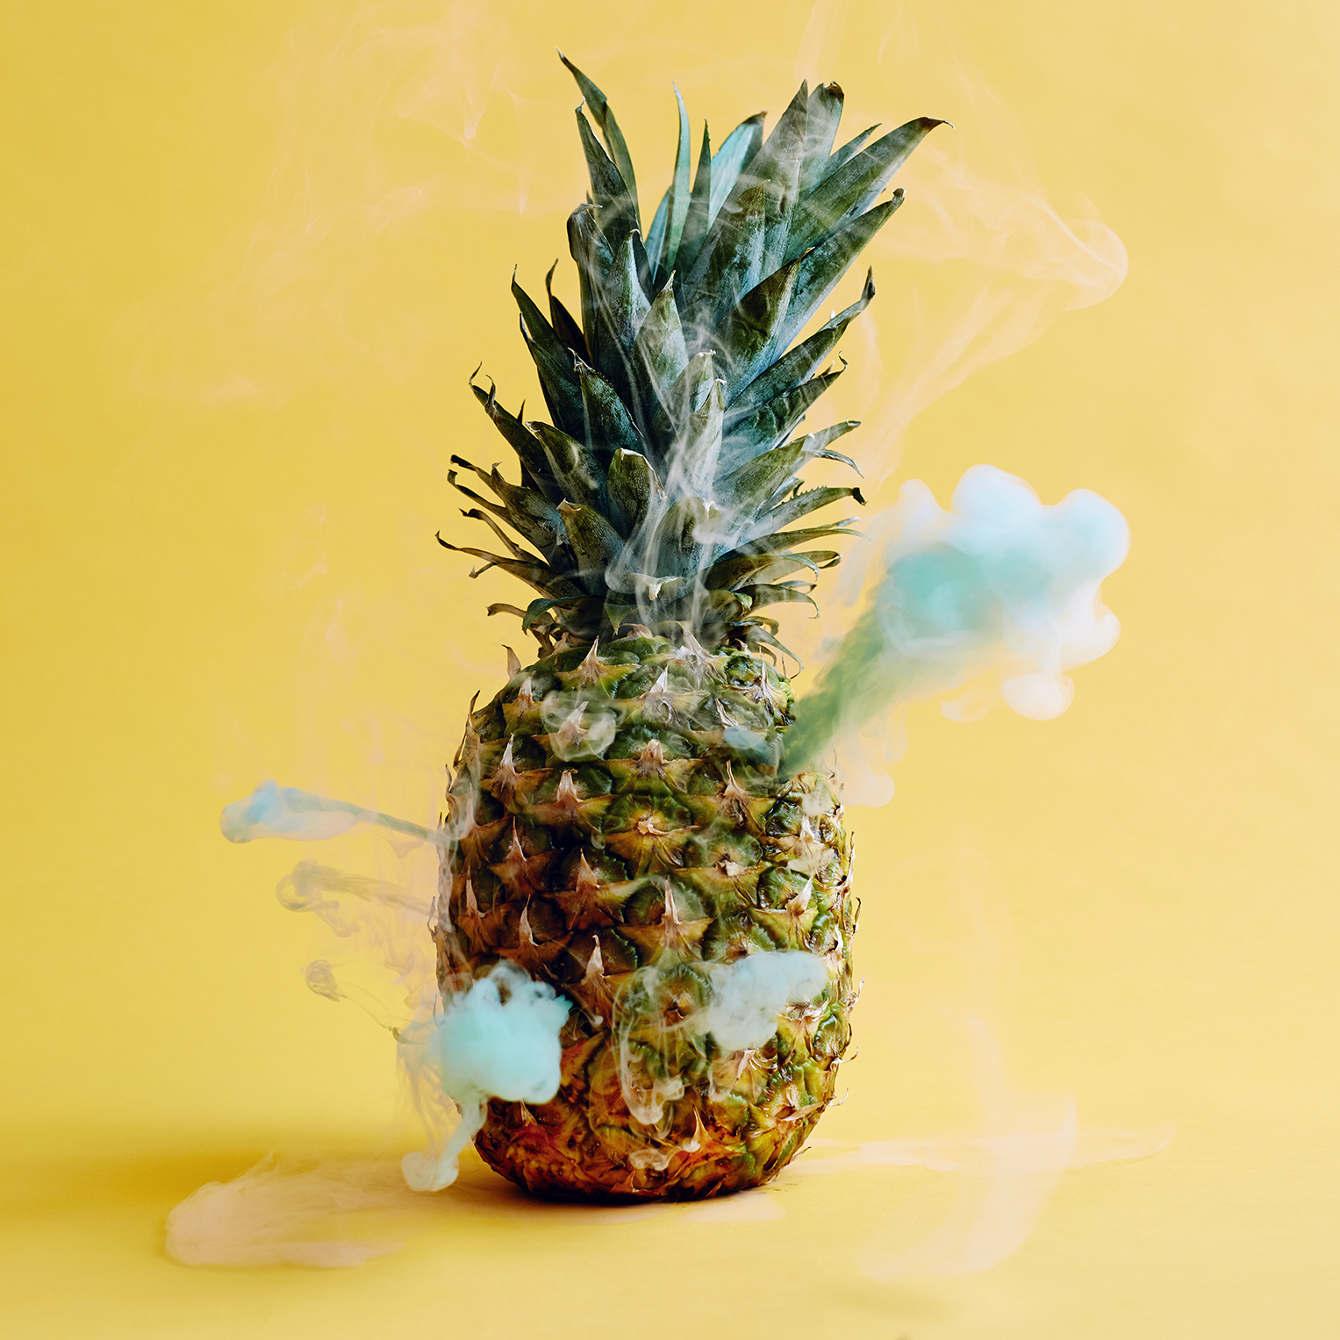 25-pineapple_1340_c.jpg